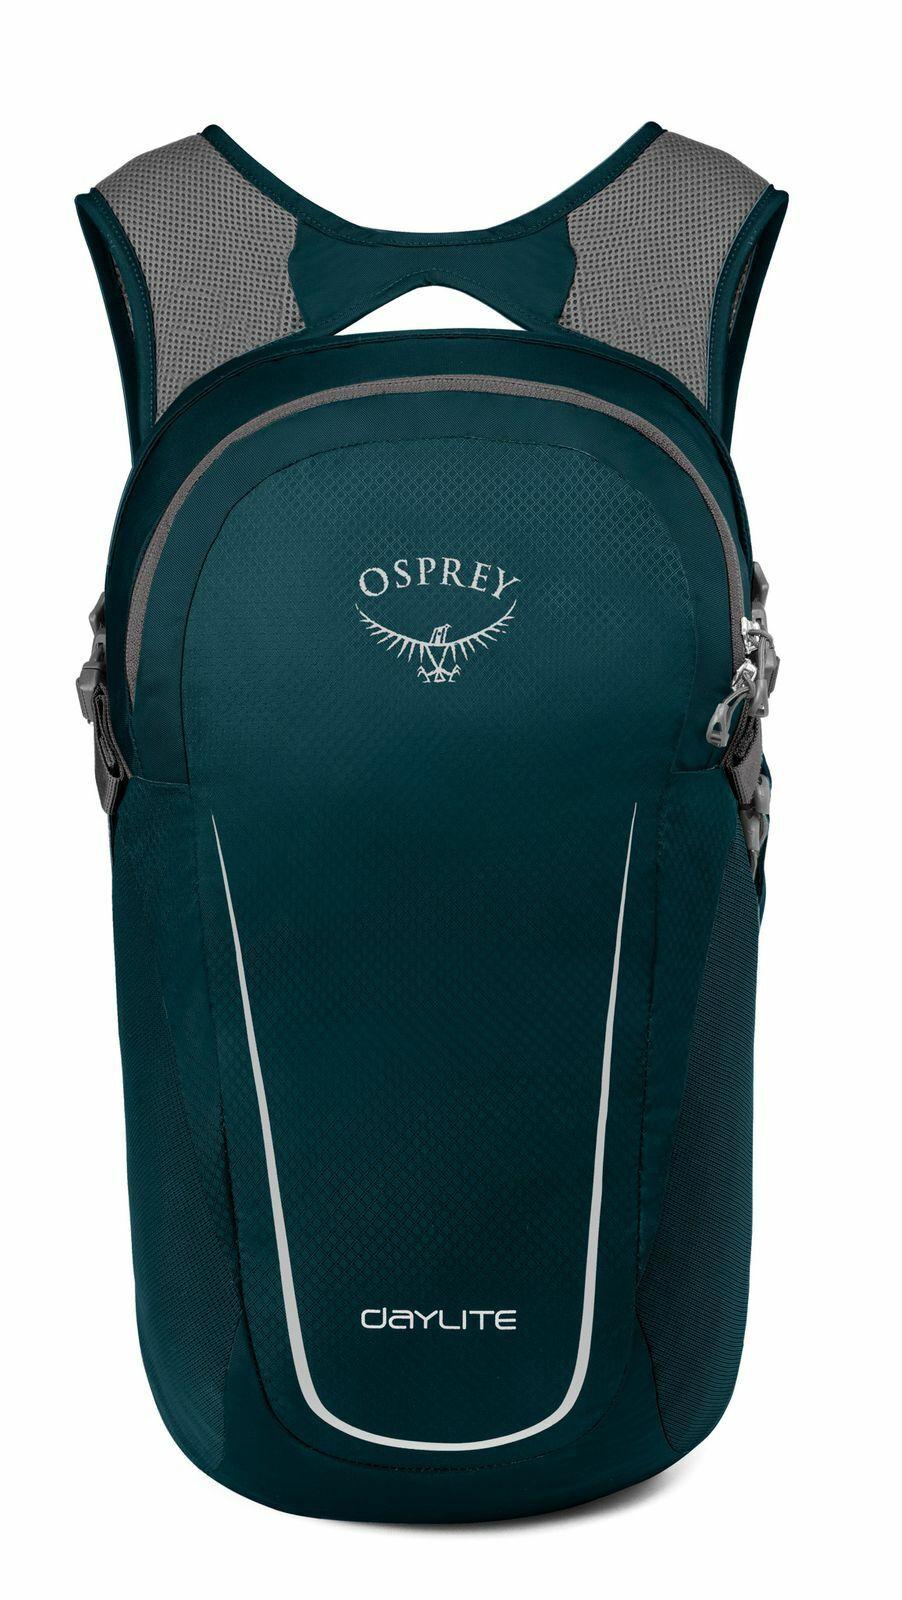 Osprey sac à dos Daylite Petrol blu